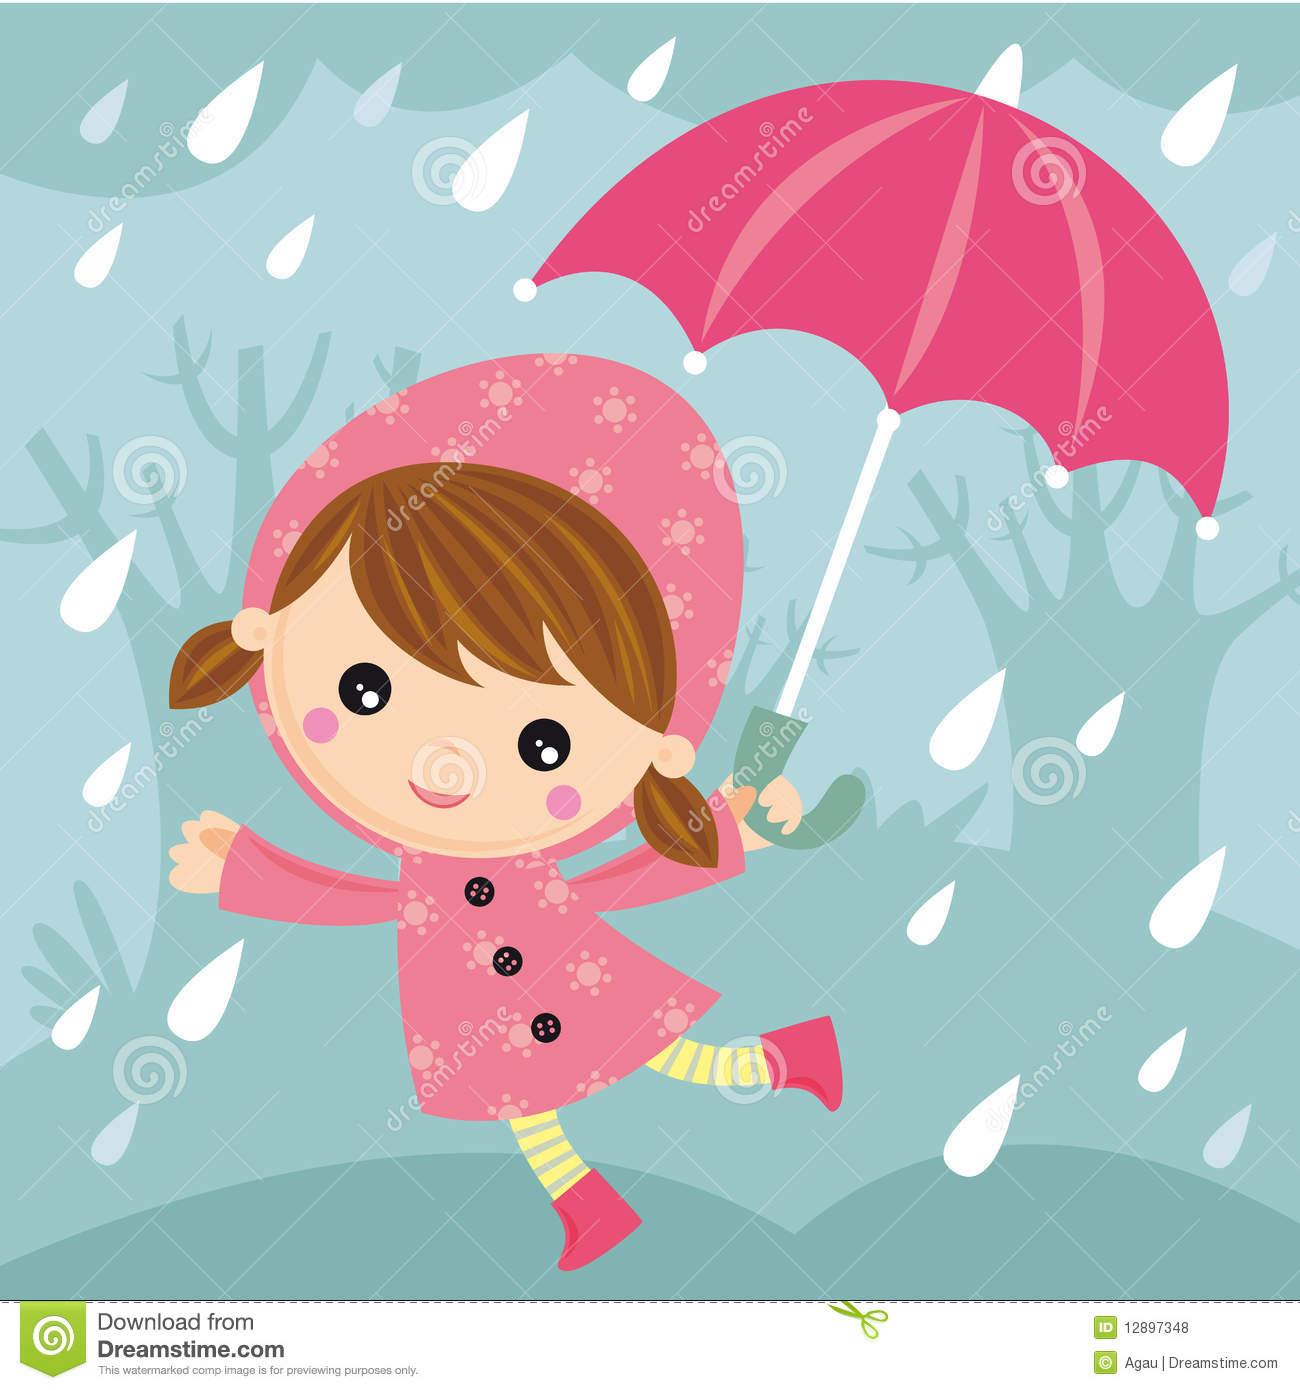 Rainy day stock vector. Illustration of happy, drop, girl.